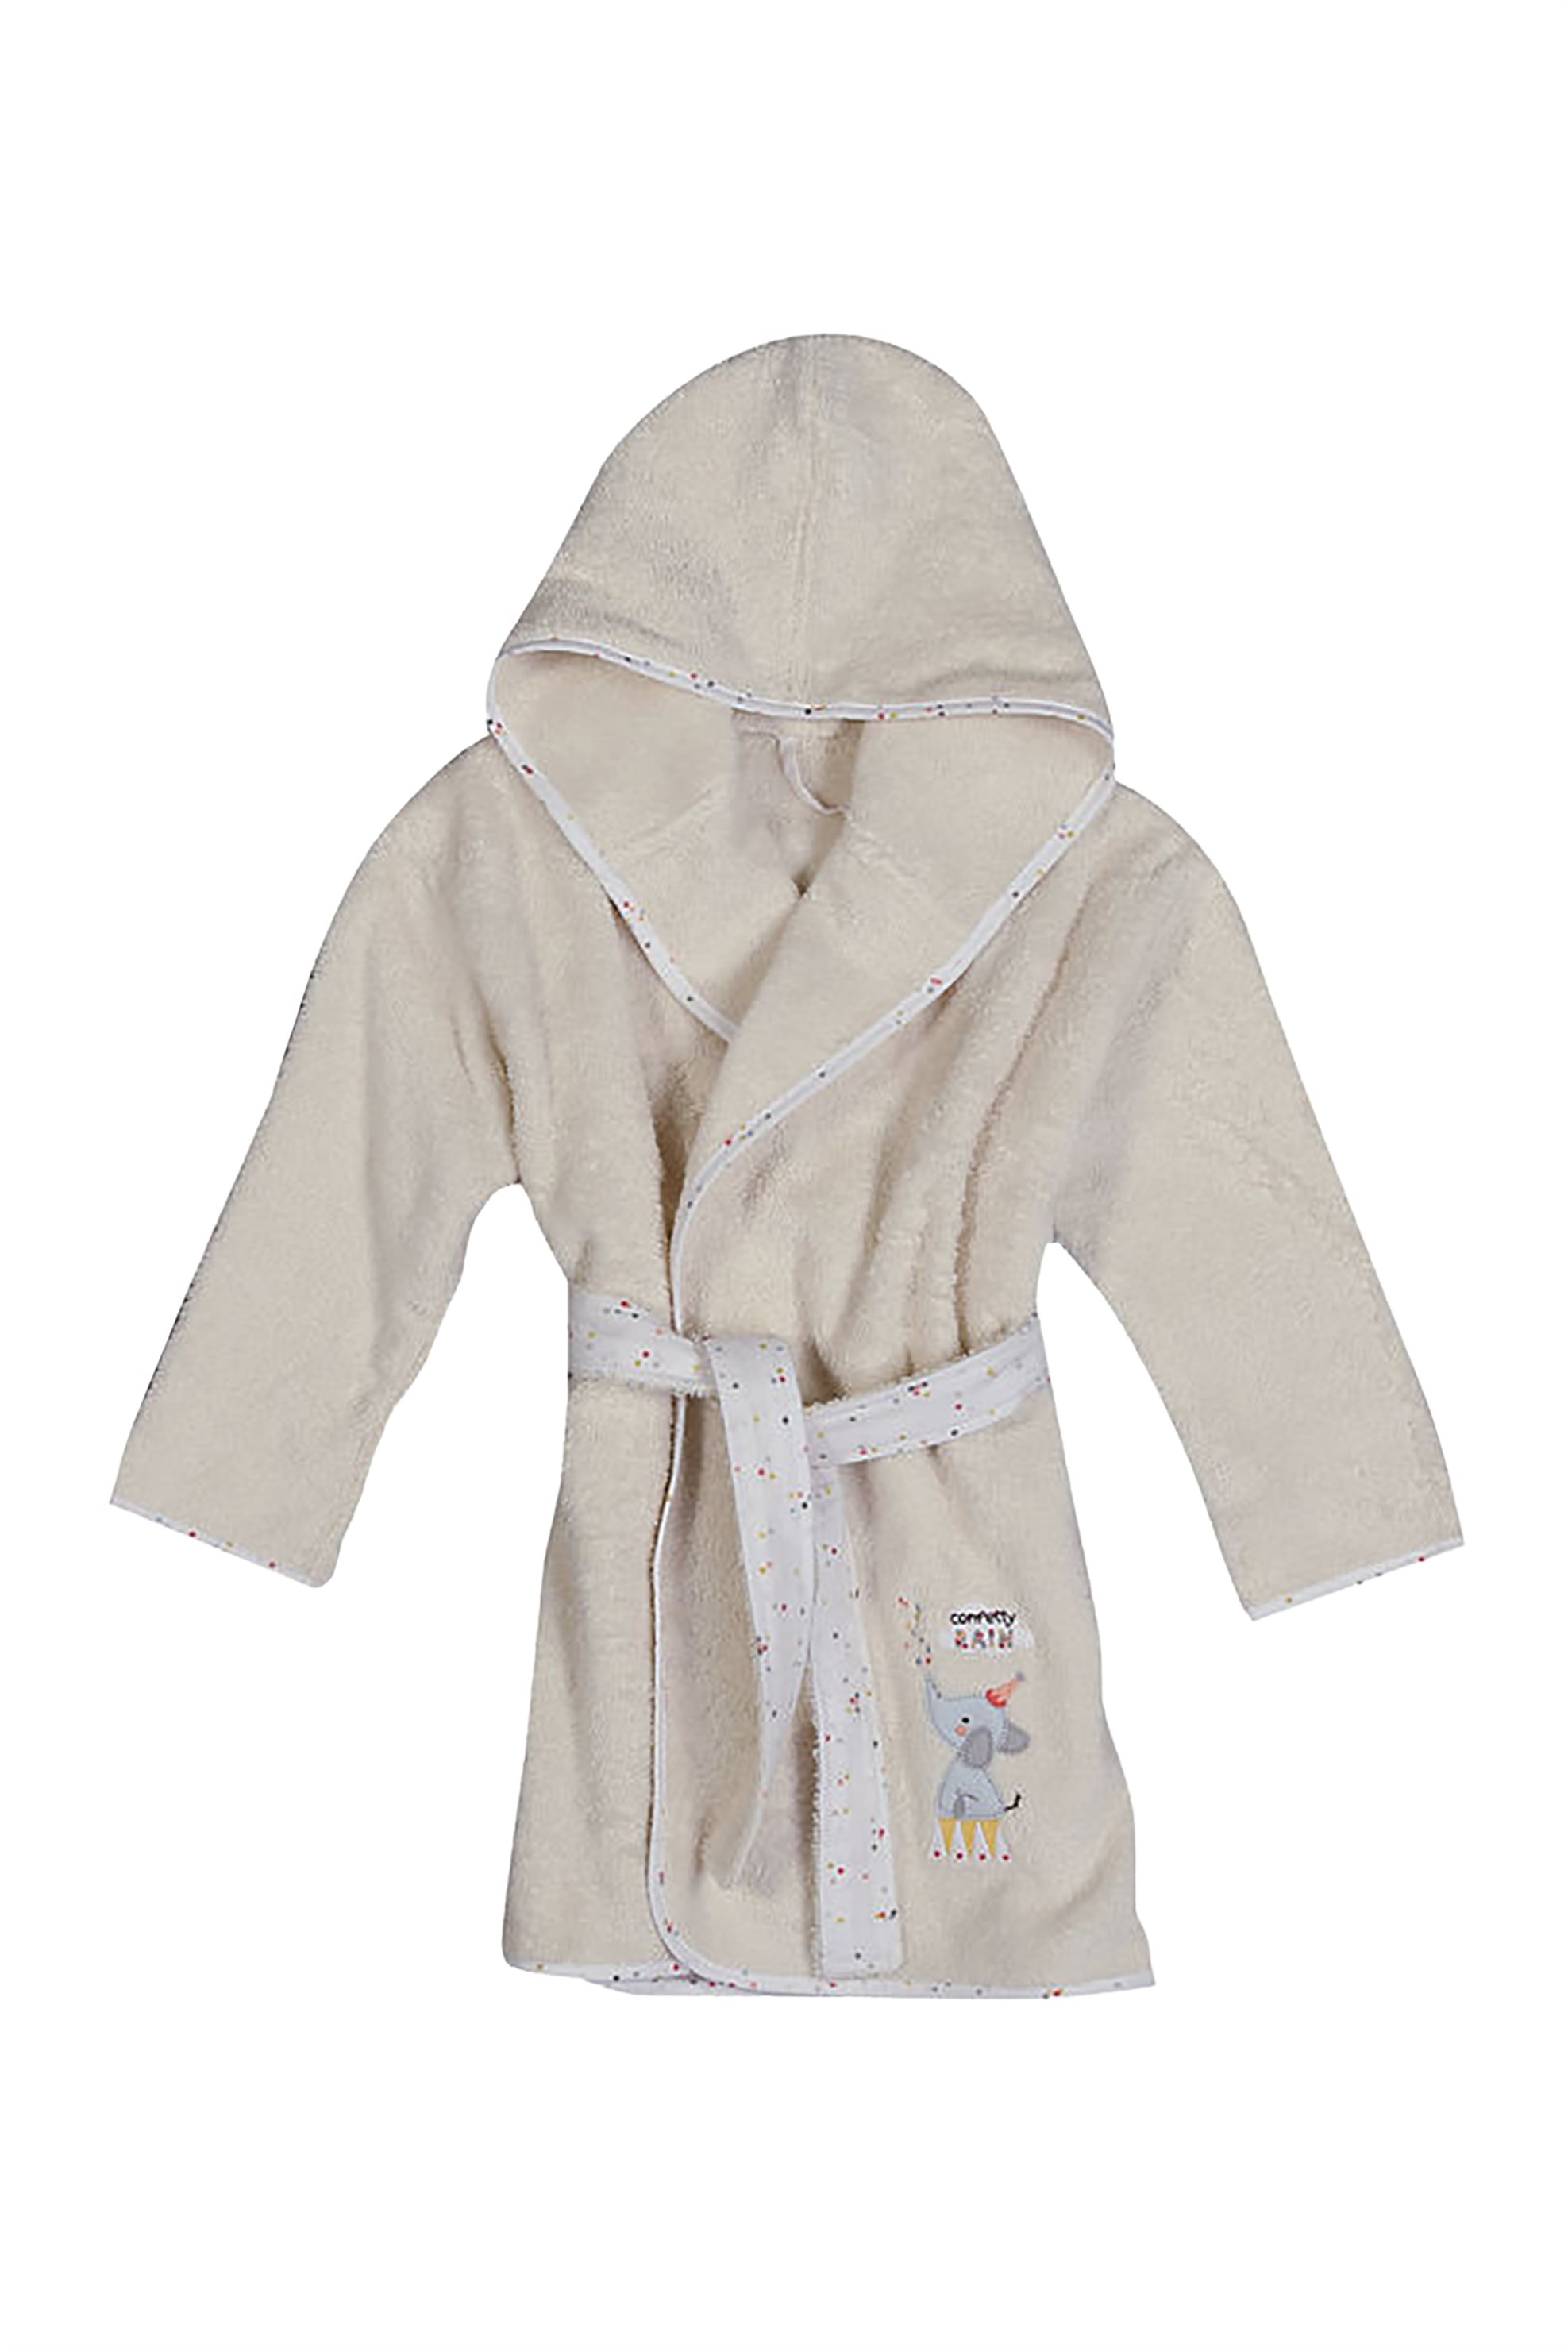 NEF-NEF Βρεφικό μπουρνούζι Confetti Rain  - 021465 - Μπεζ home   παιδια   παιδικά μπουρνούζια   ρόμπες